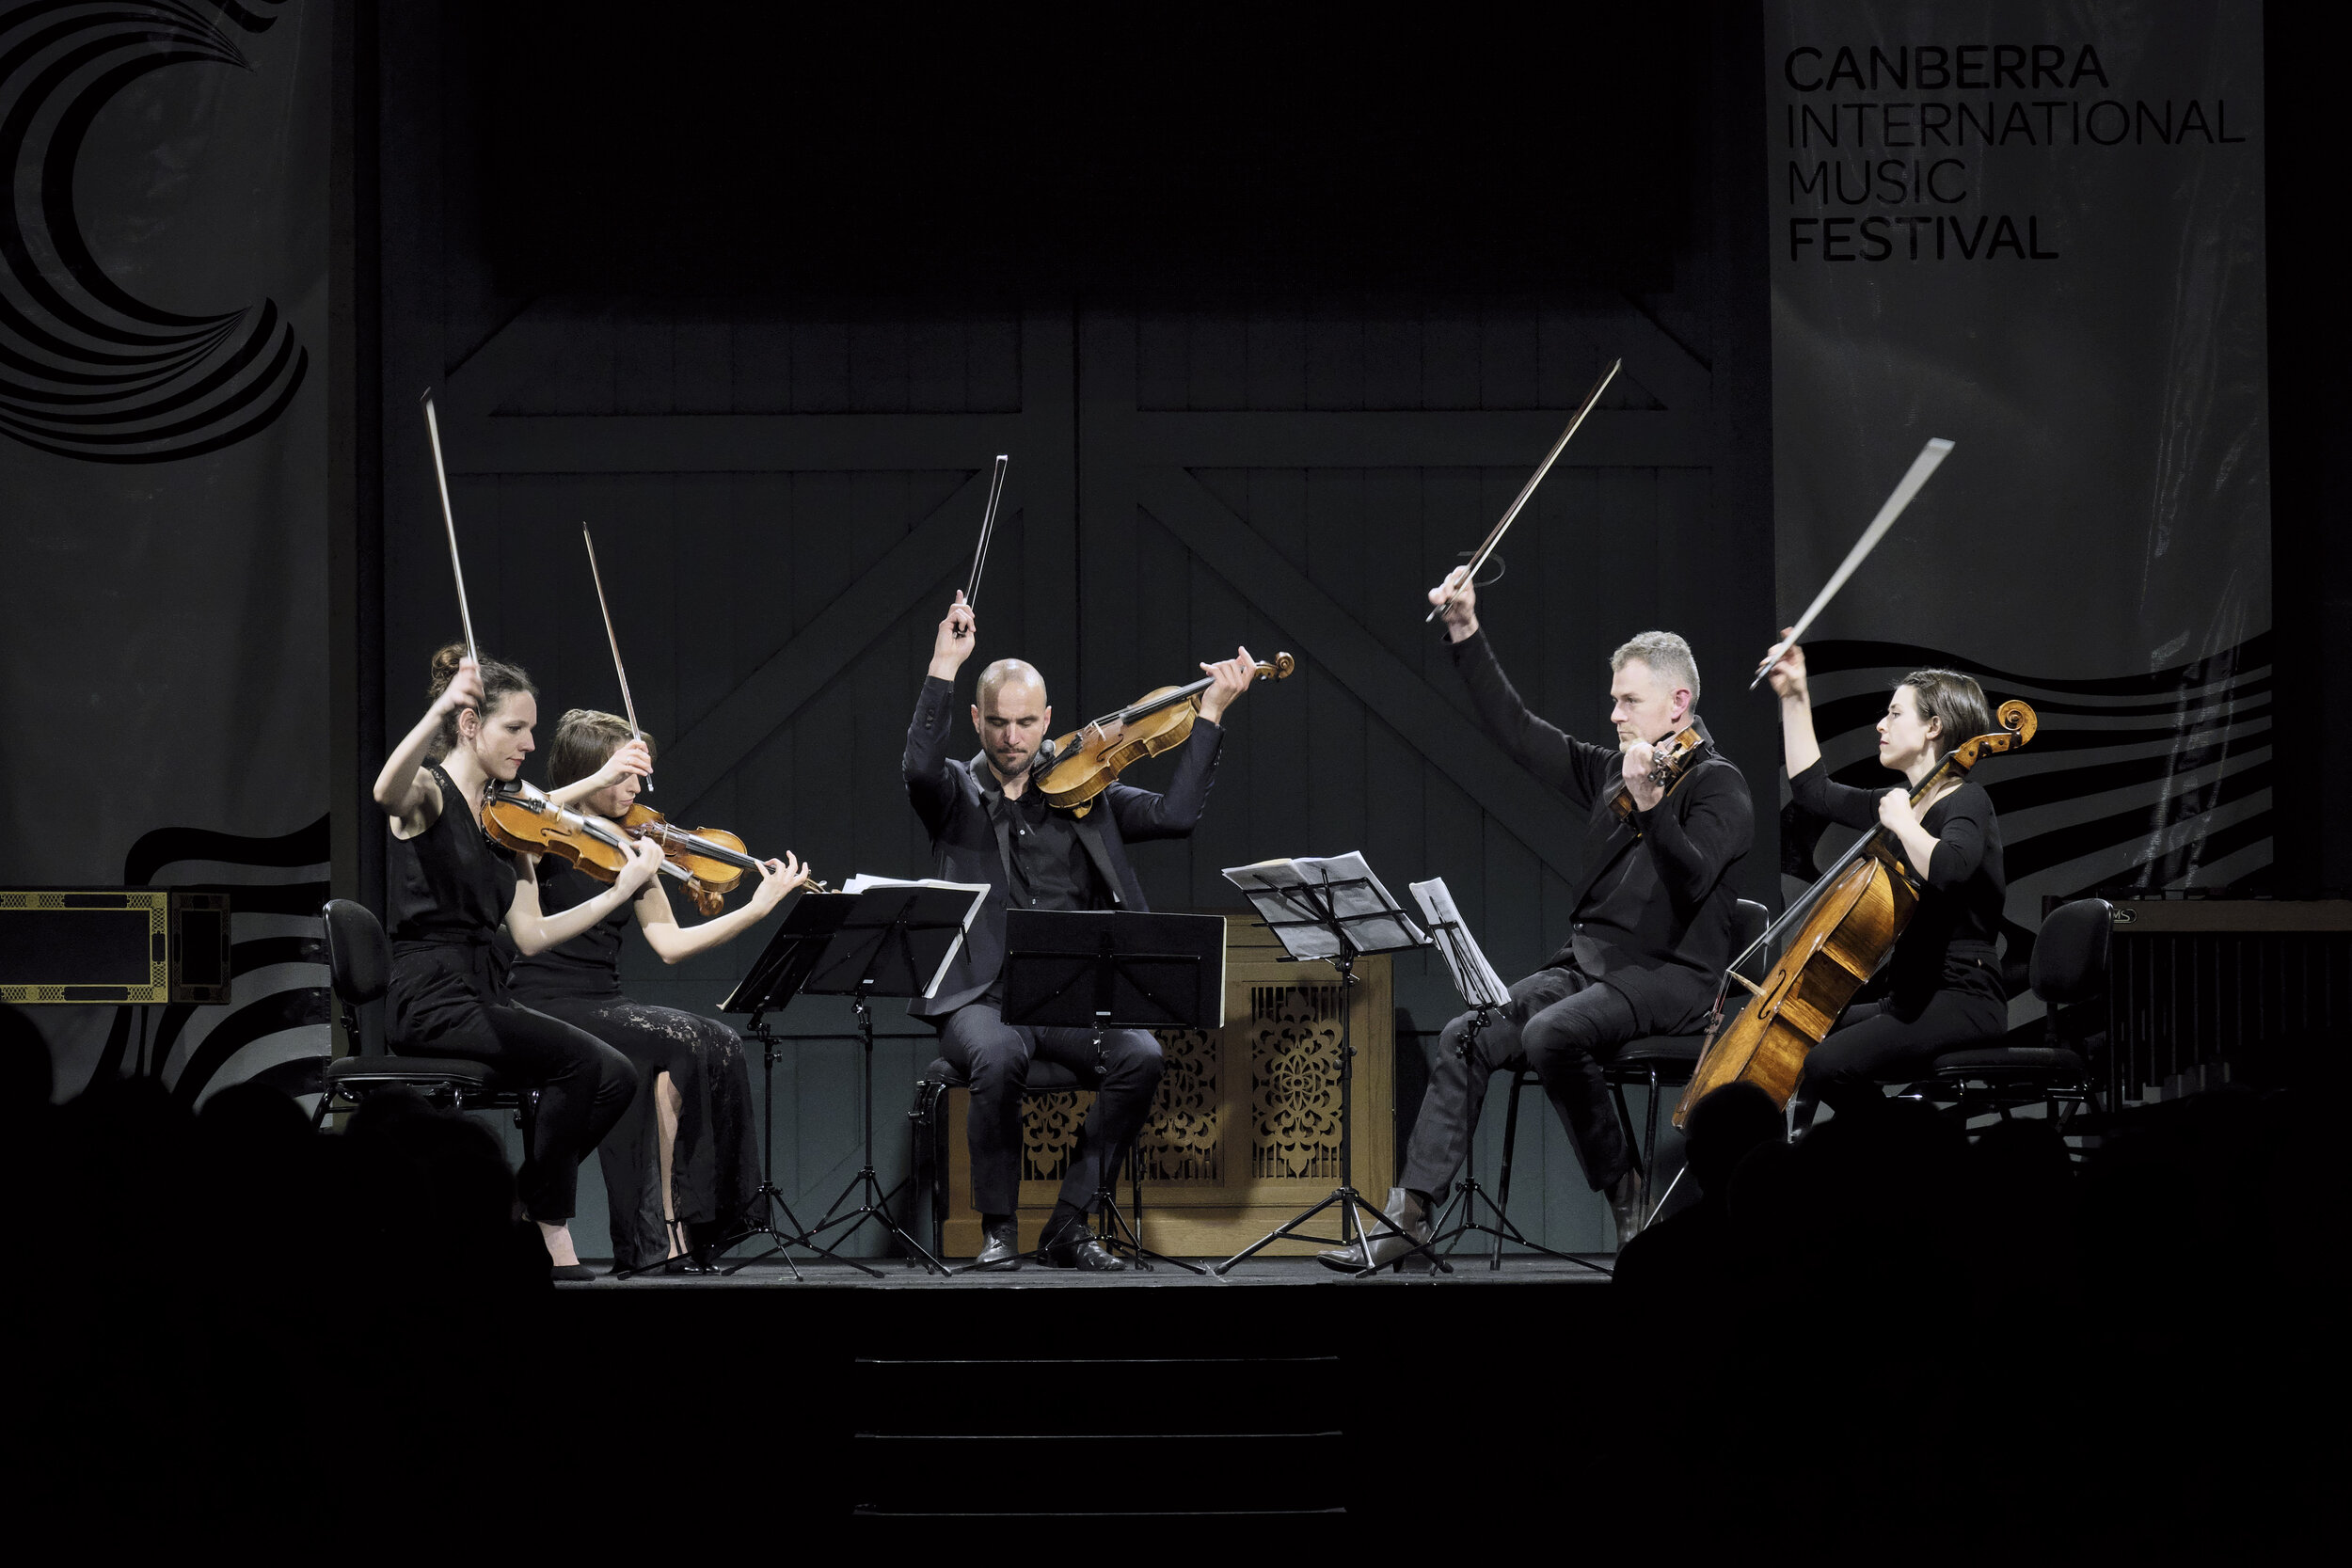 Concert 08. The Three Bs. Quatuor VocePhoto by Peter Hislop